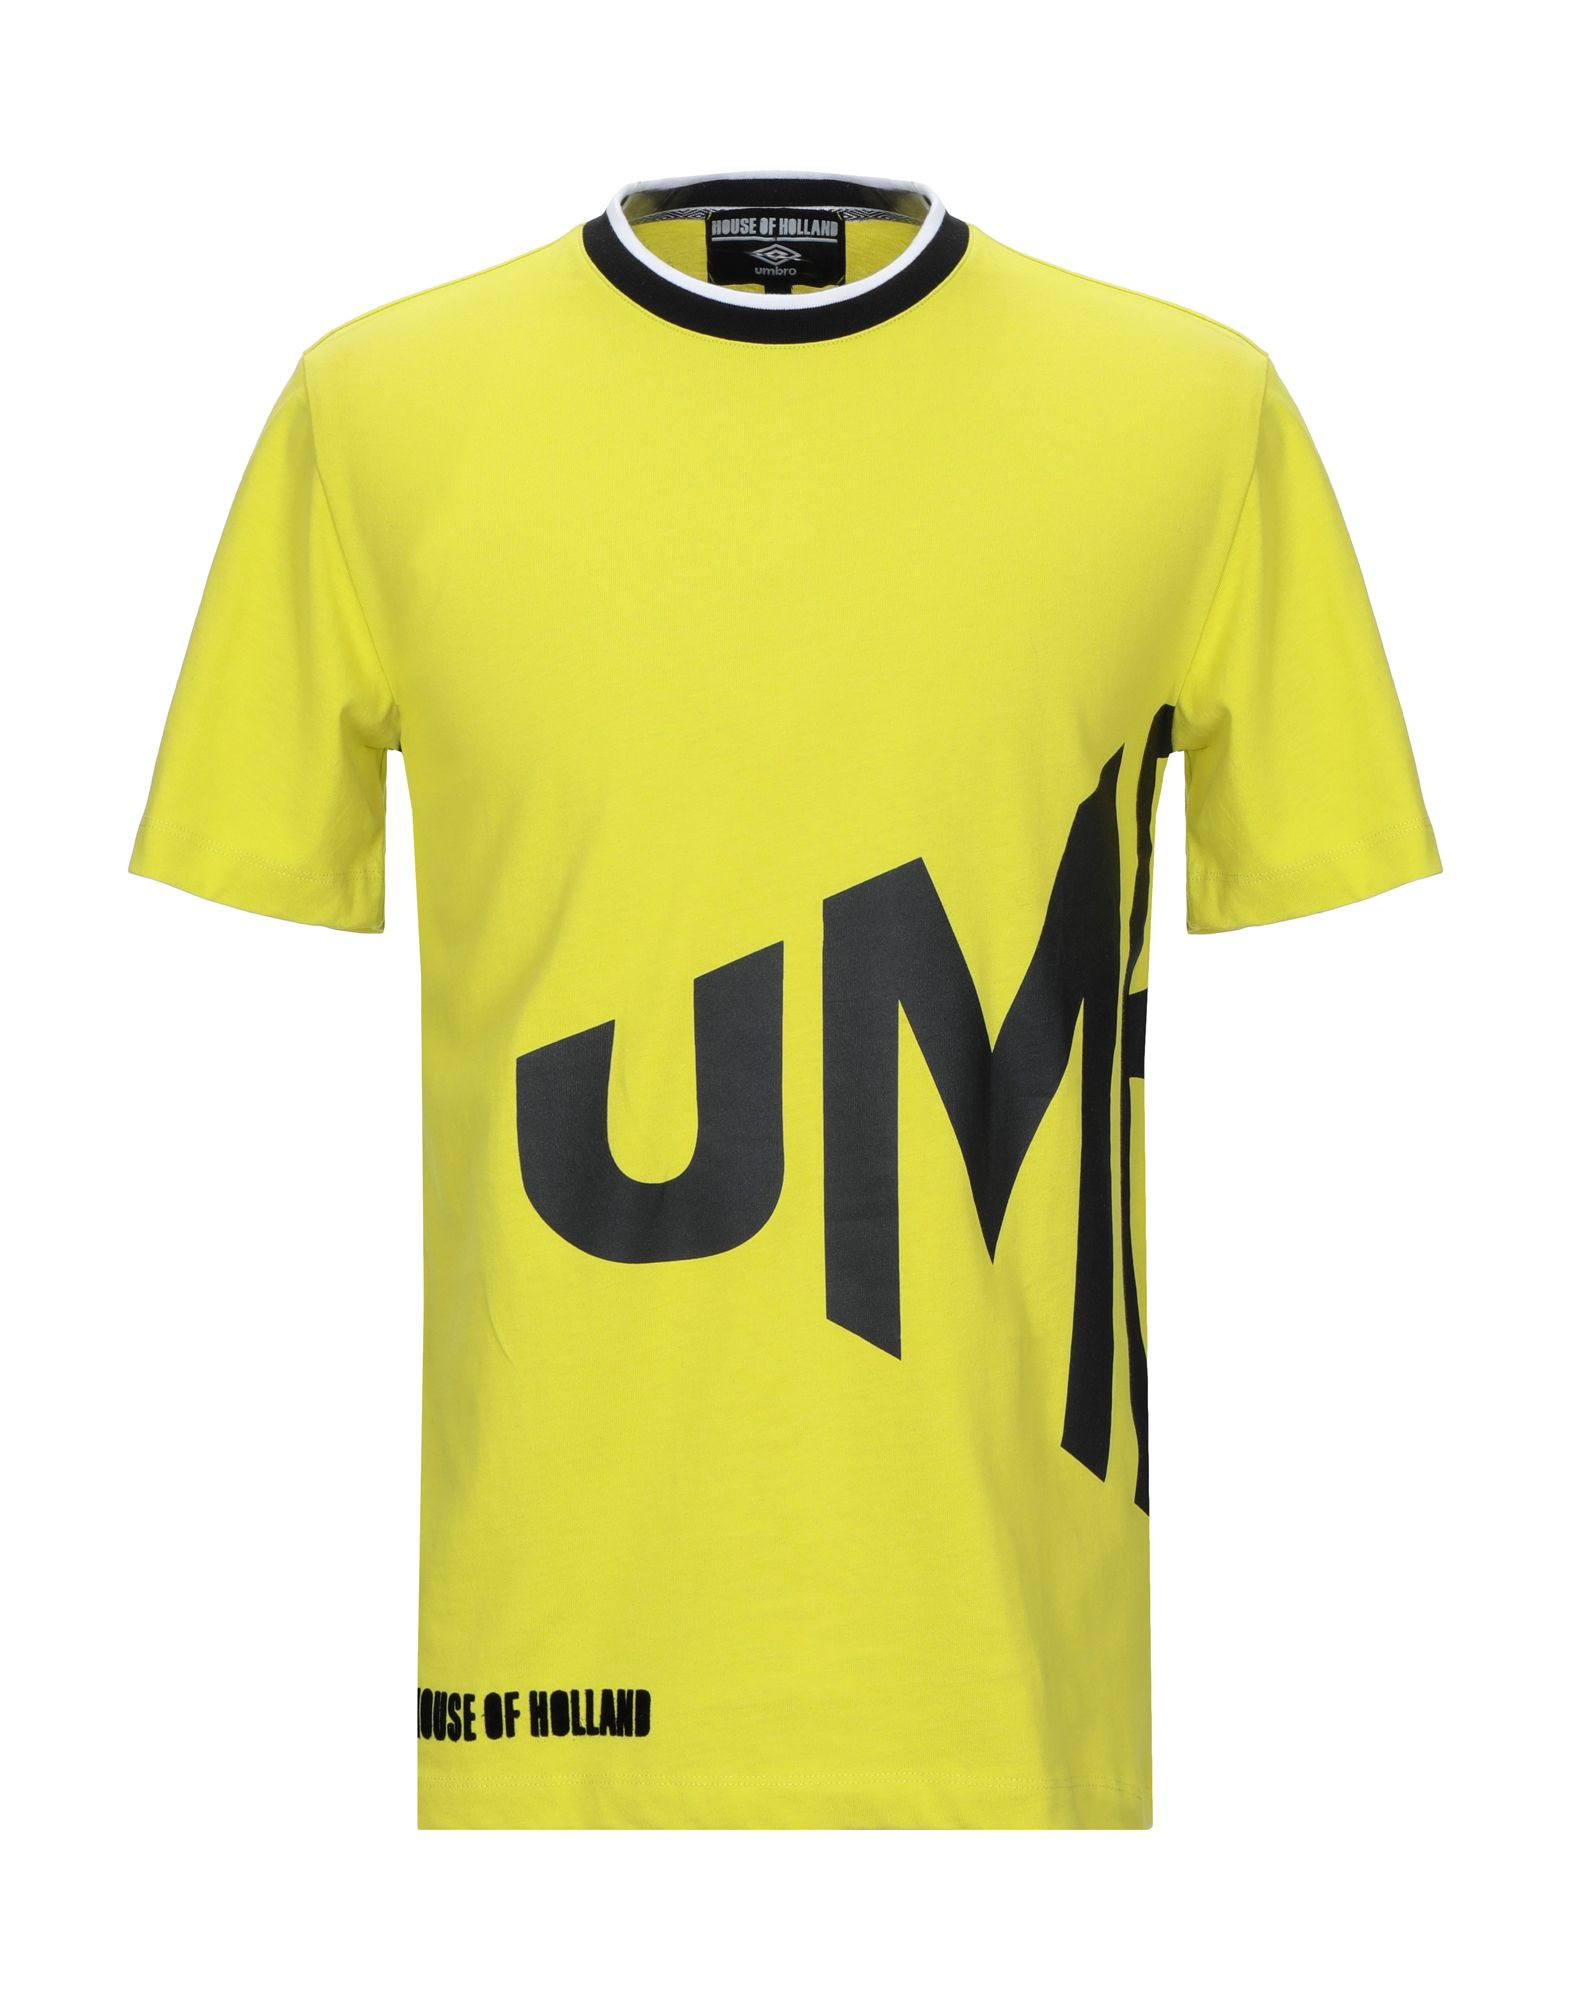 UMBRO x HOUSE OF HOLLAND Футболка umbro x house of holland футболка